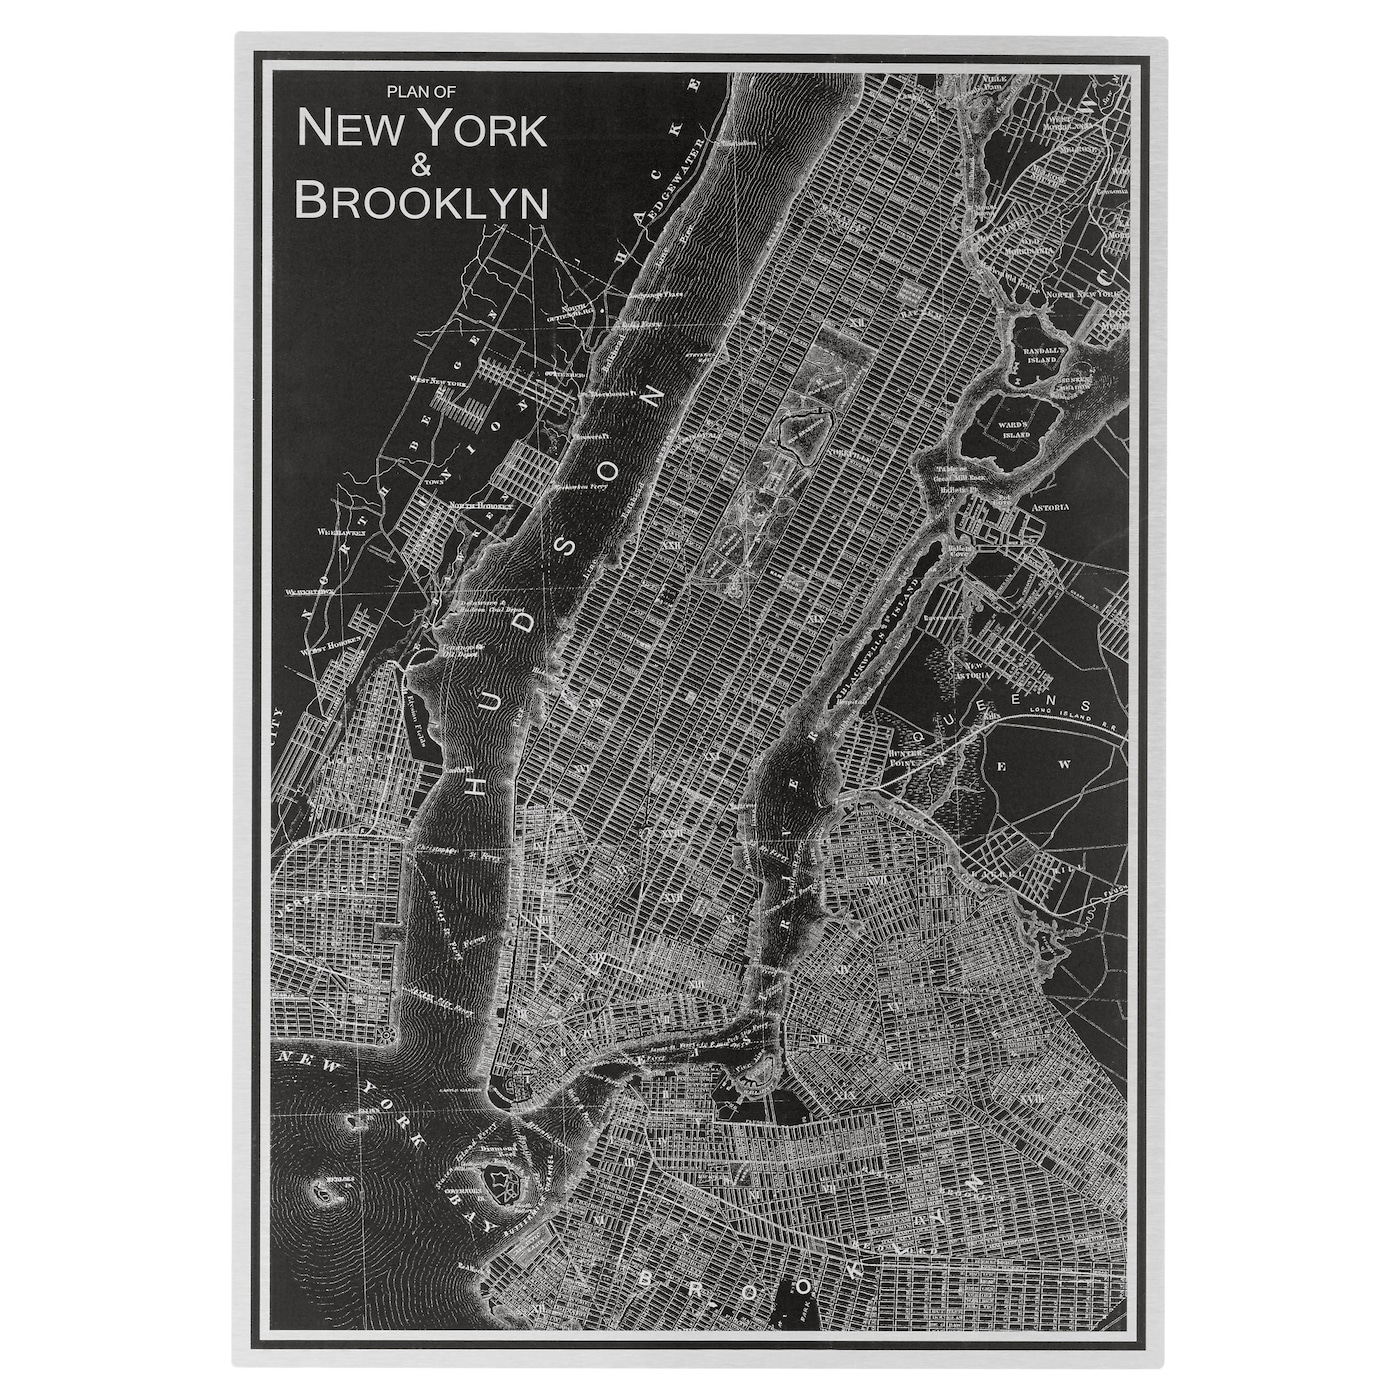 dieci migliori bar di aggancio a NYC evow dating app